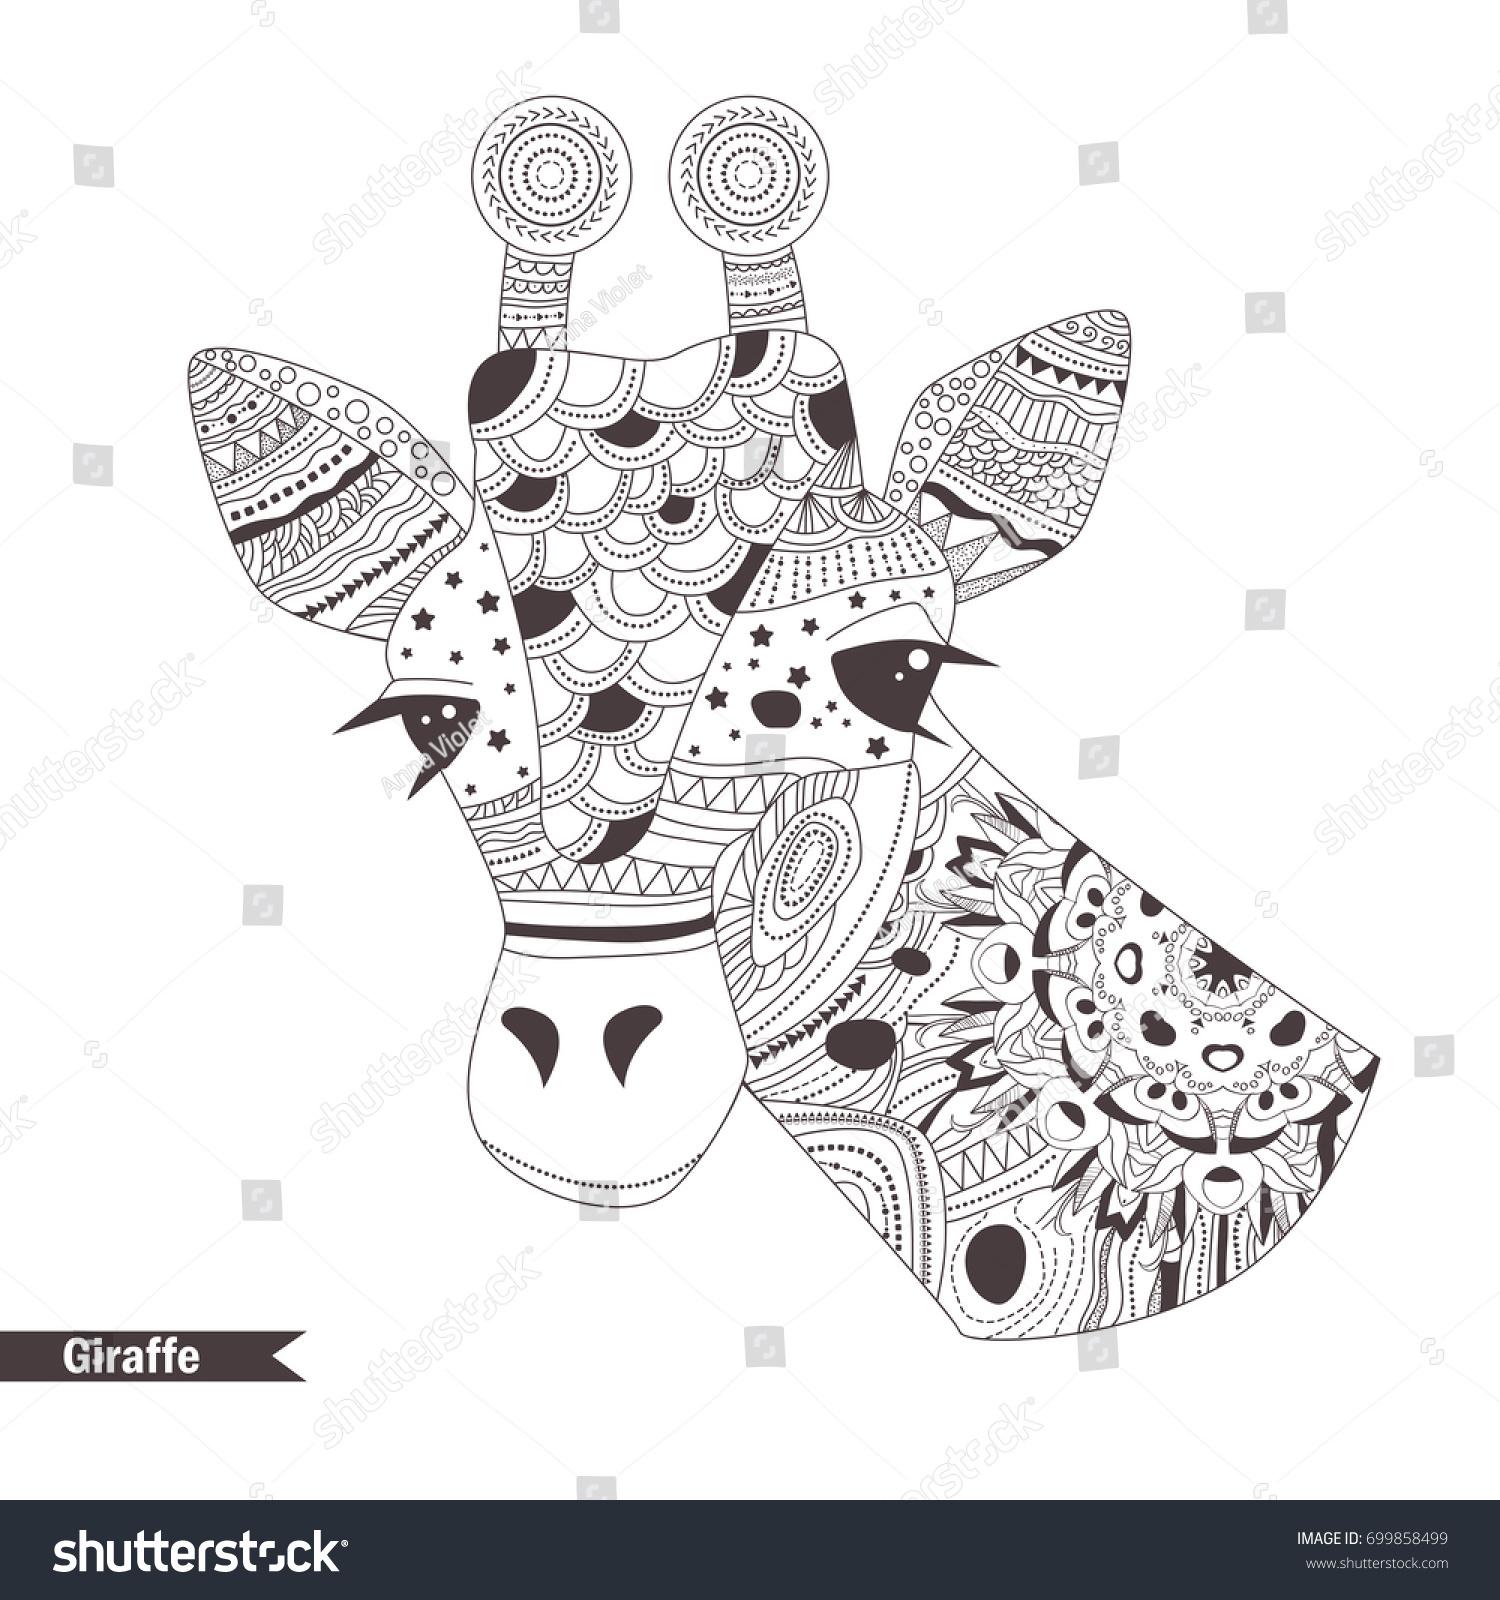 Giraffe Zentangle Style Coloring Book Adult Stock Vector 699858499 ...